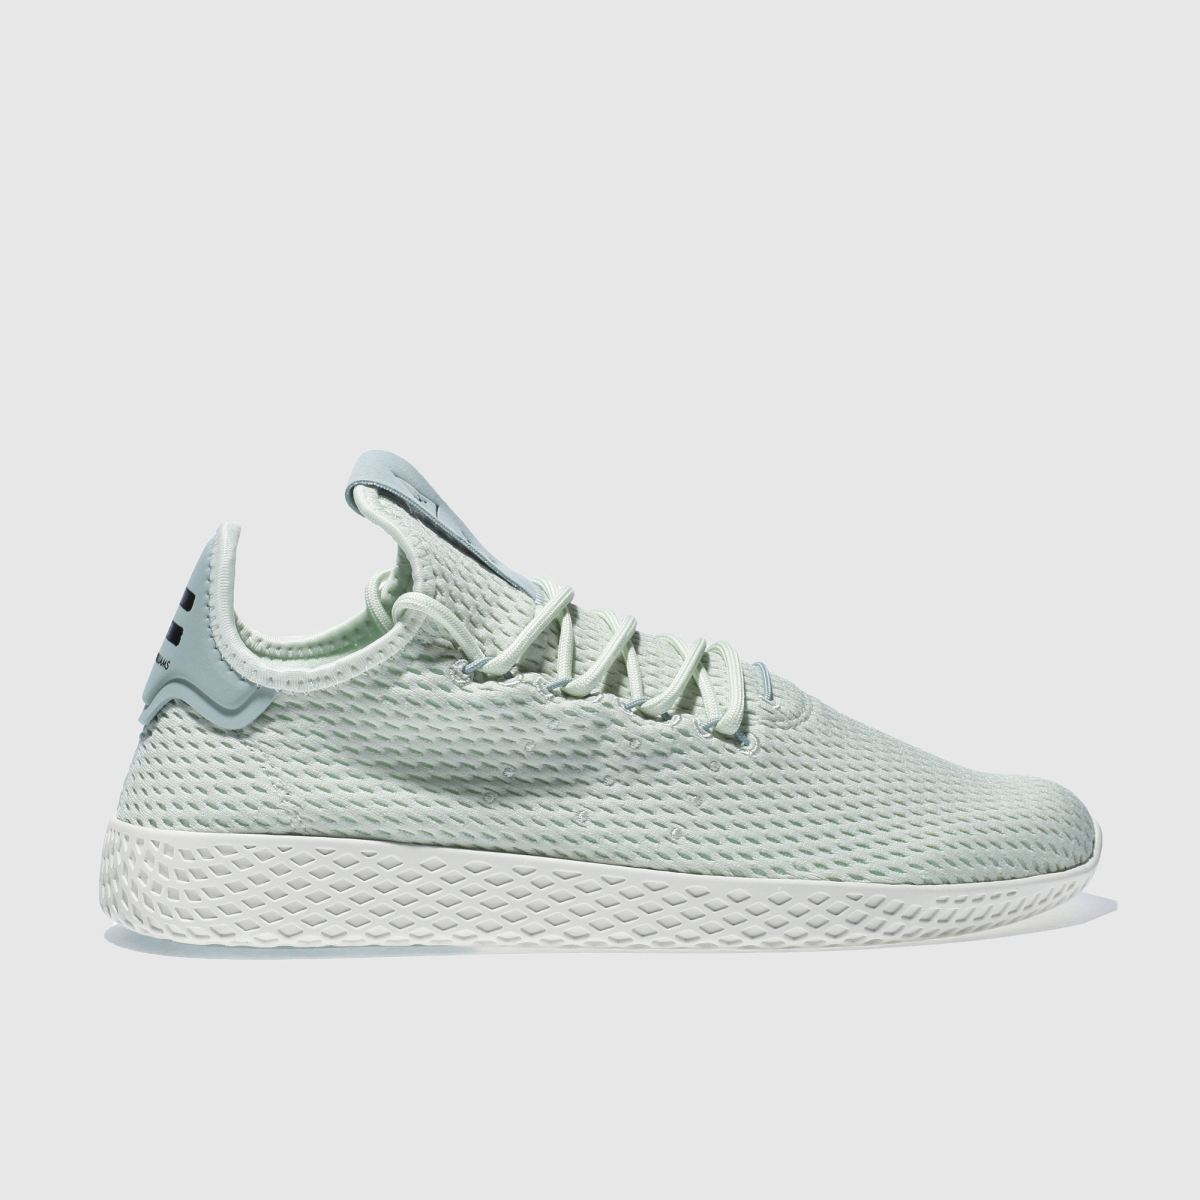 adidas light green pharrell williams tennis hu trainers